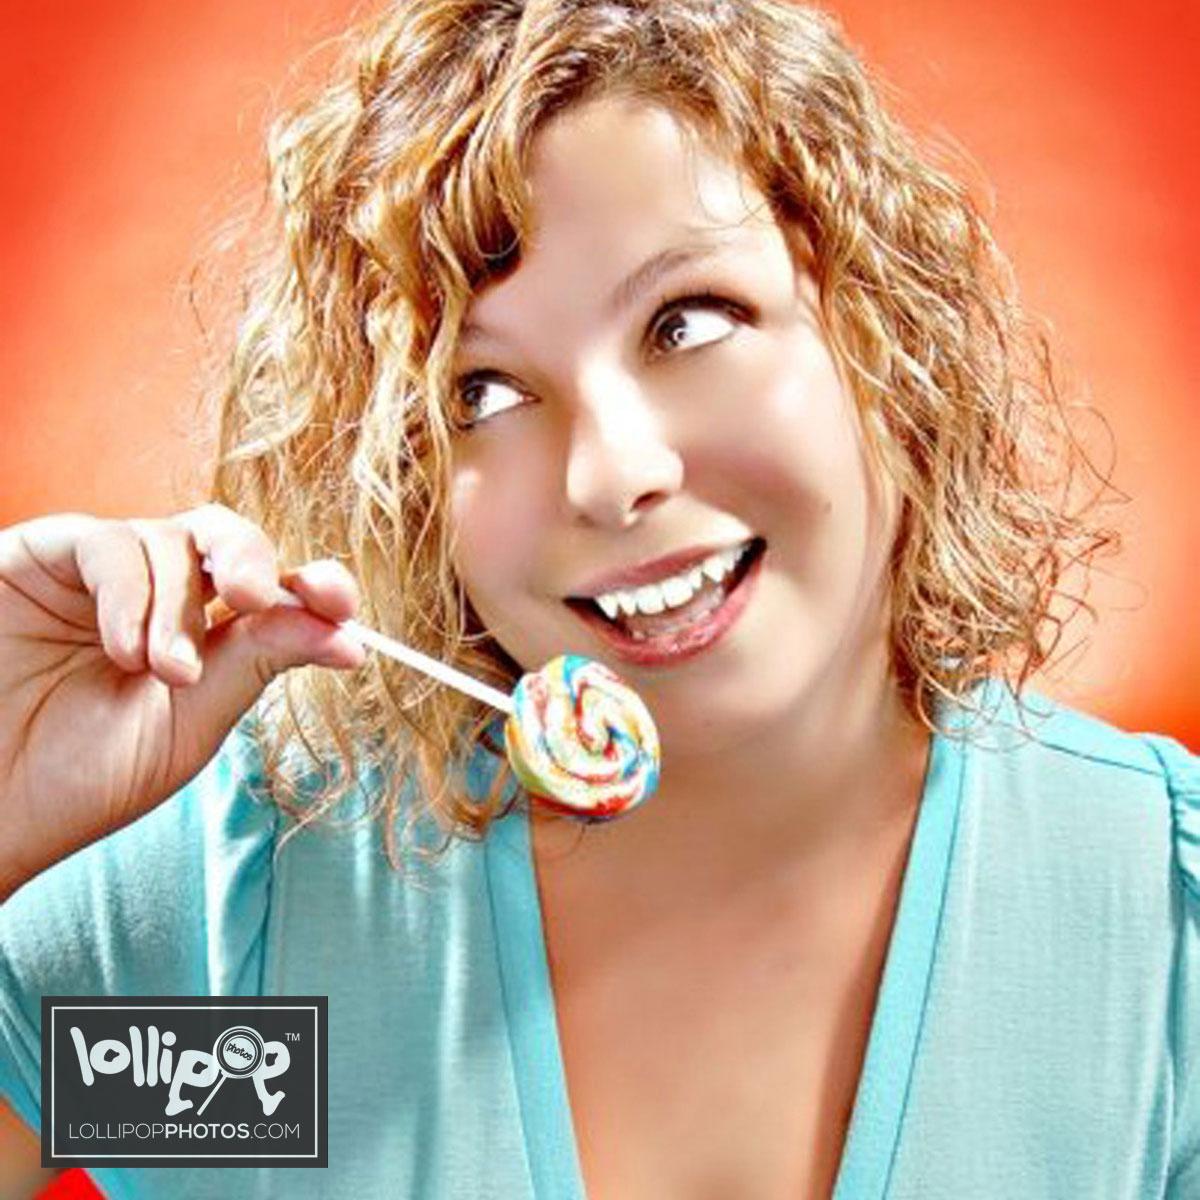 msdig-nora-canfield-lollipop-photos-153.jpg